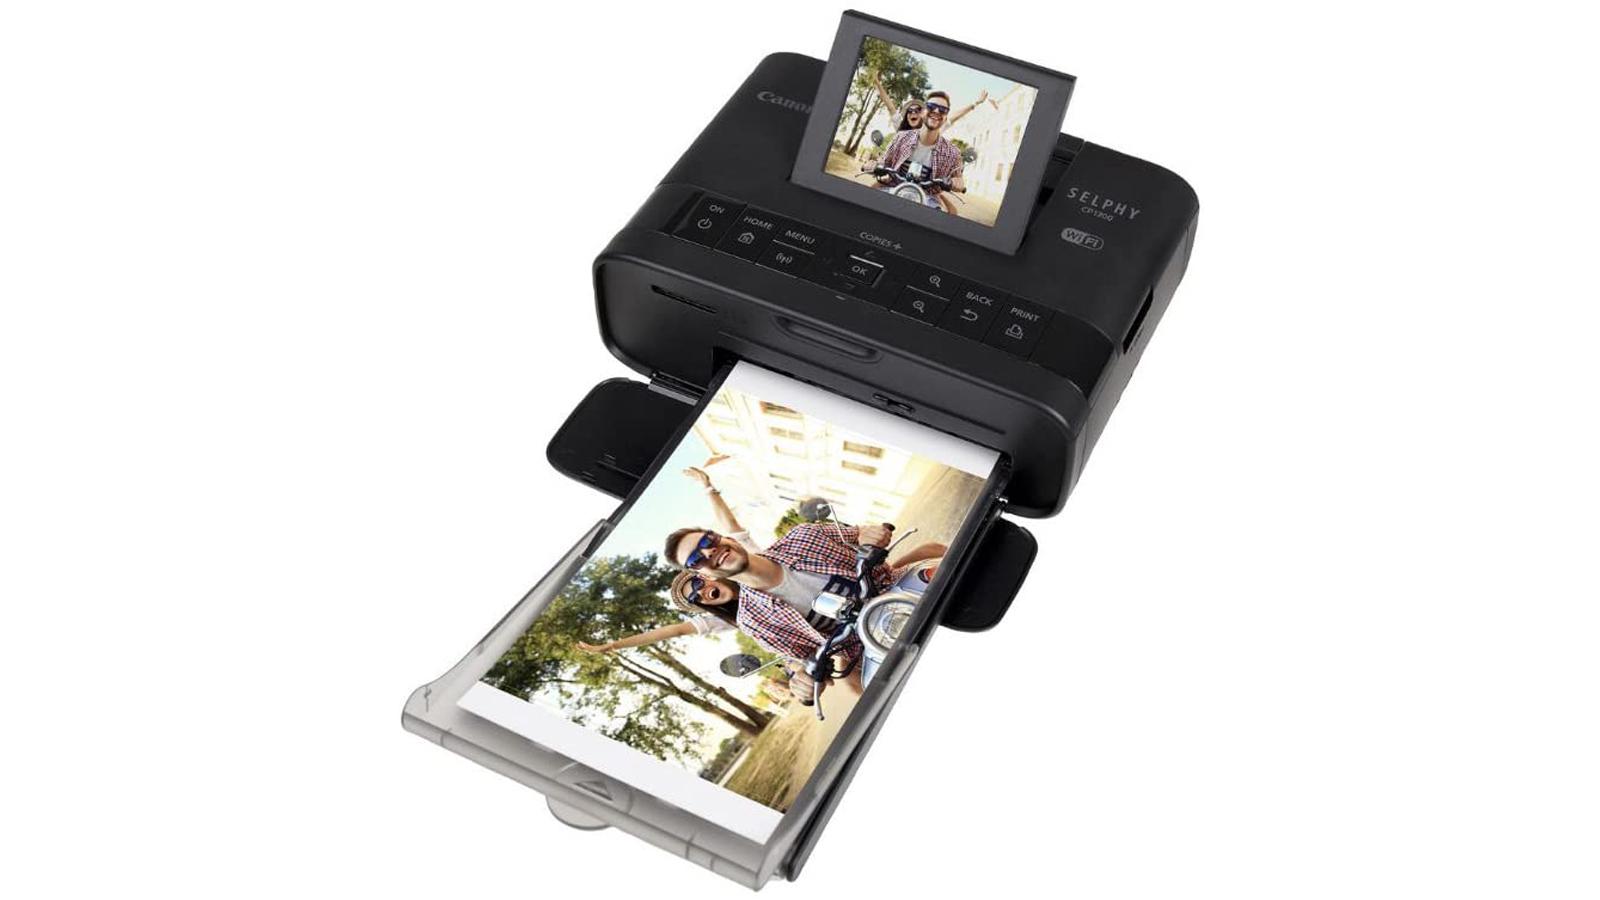 Canon Selphy best heavy-duty portable photo printer